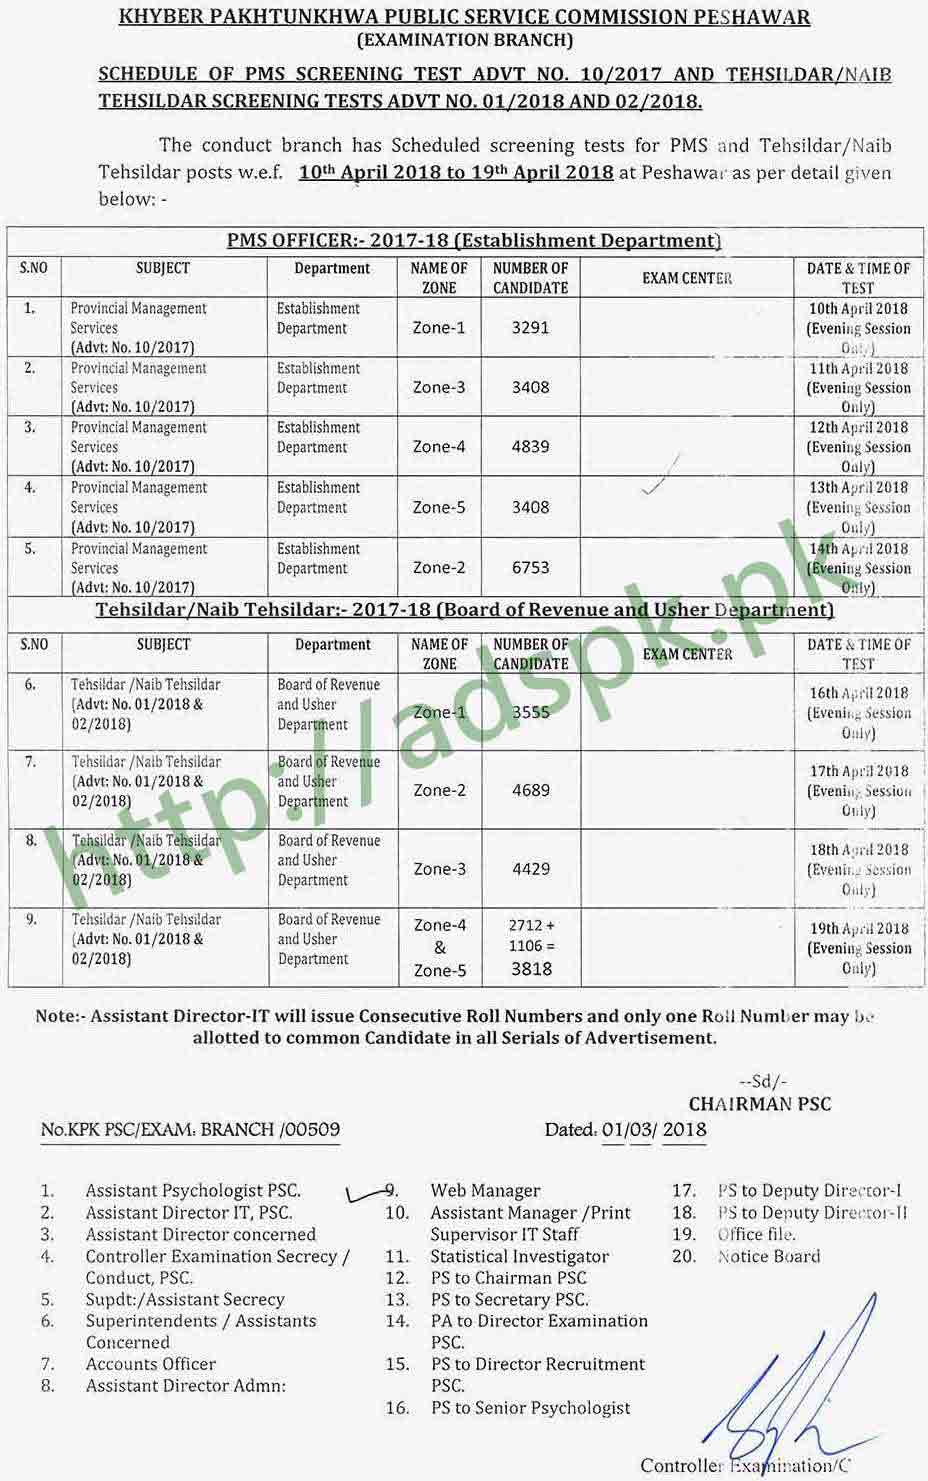 KPPSC Date Sheet Ability Test PMS Tehsildar Naib Tehsildar April 2018 by Khyber Pakhtunkhwa Public Service Commission Peshawar